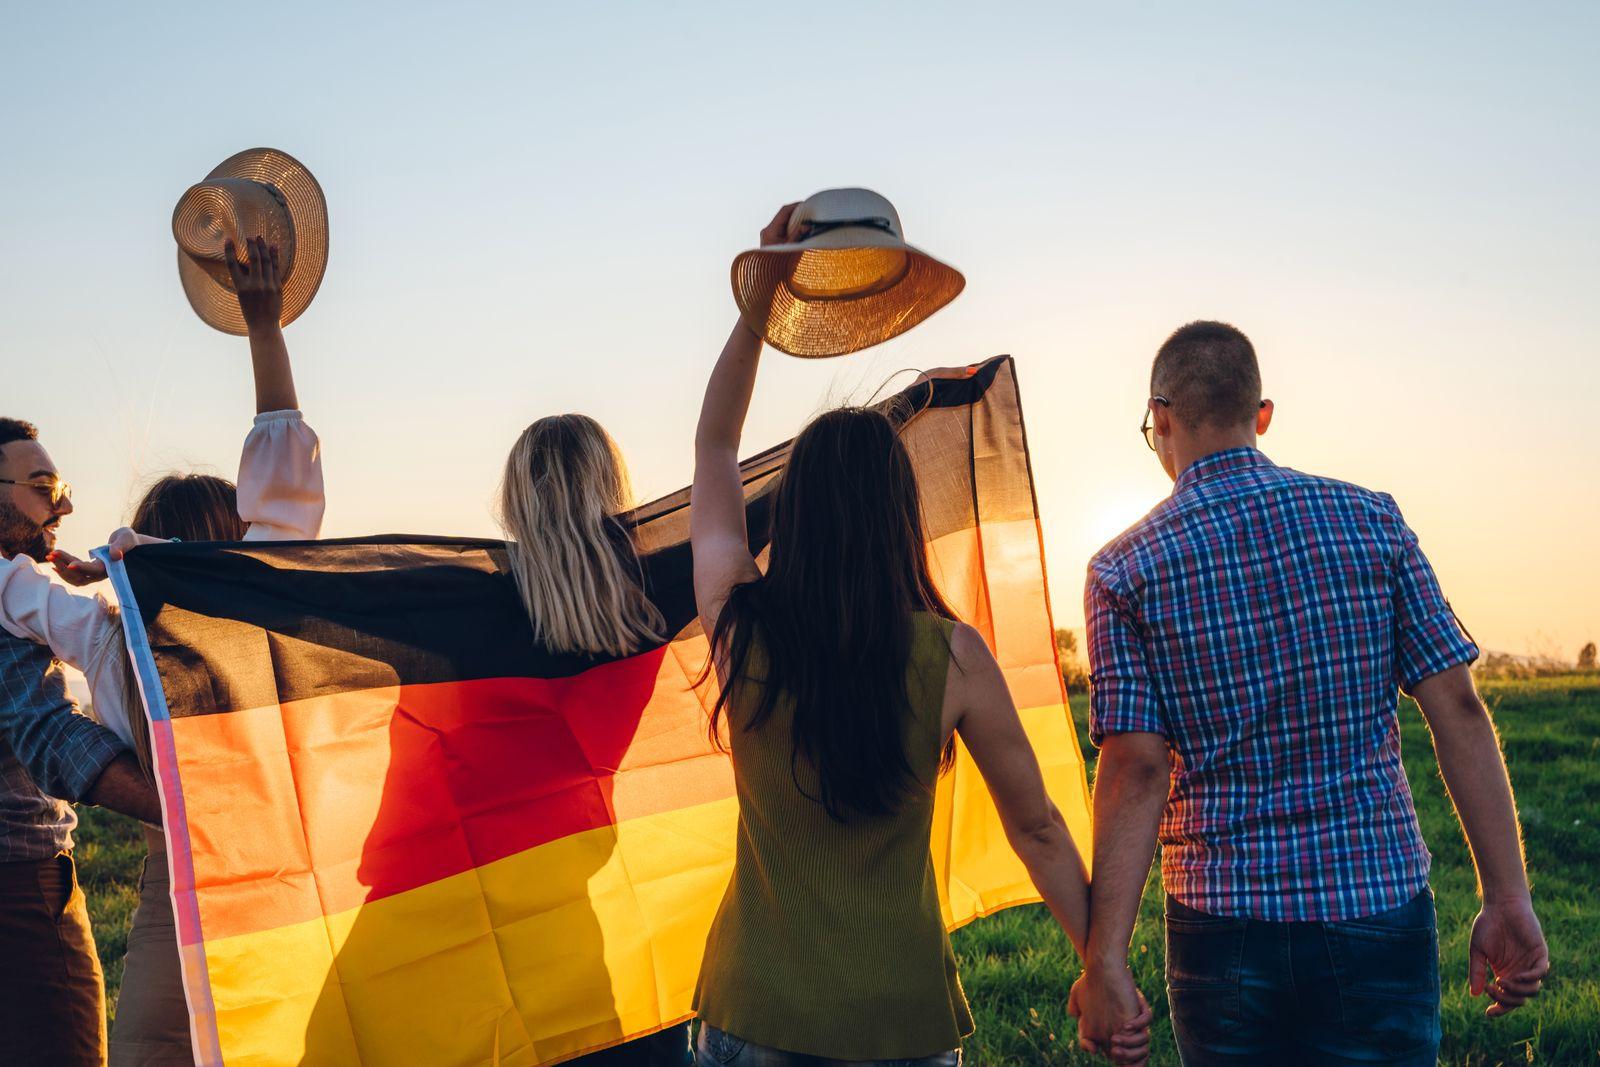 Spreading german flag